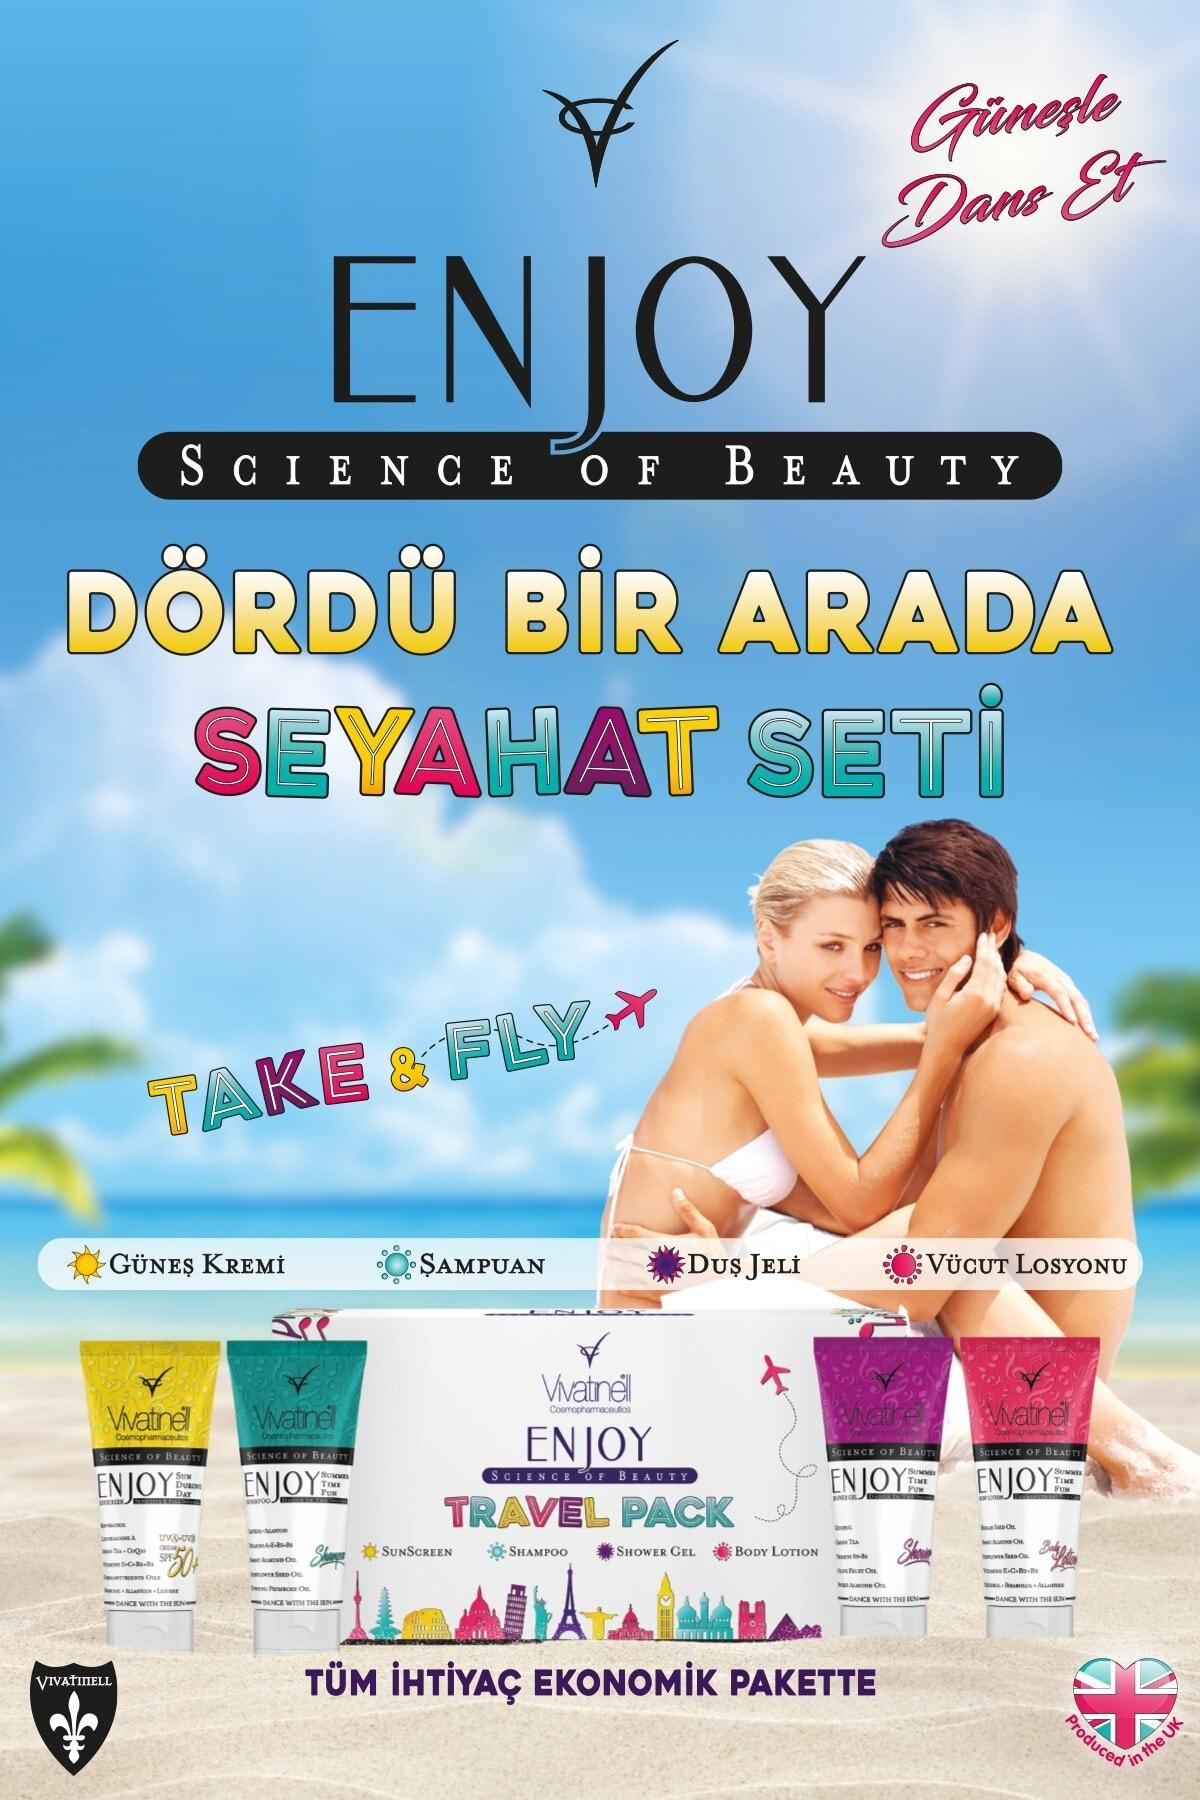 Enjoy Travel Pack Spf 50+ Güneş Kremi & Şampuan & Duş Jeli & Vücut Losyonu 4 x 100 ml 5060409581925 2